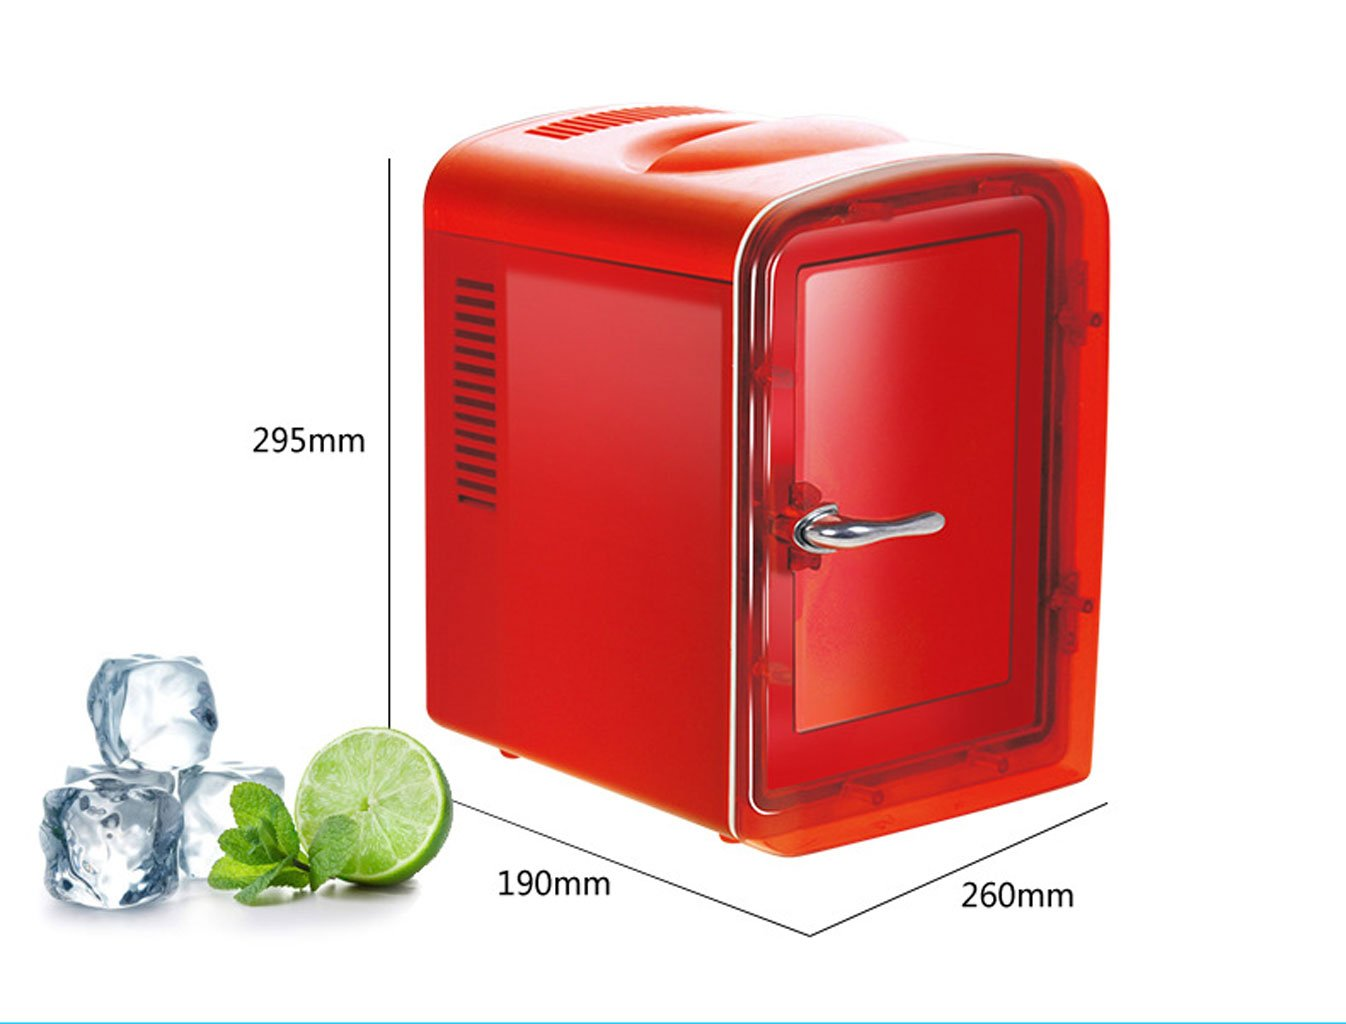 Mini Kühlschrank Pkw : Mini kühlschrank pkw rosenstein söhne mini kühlschrank v mit